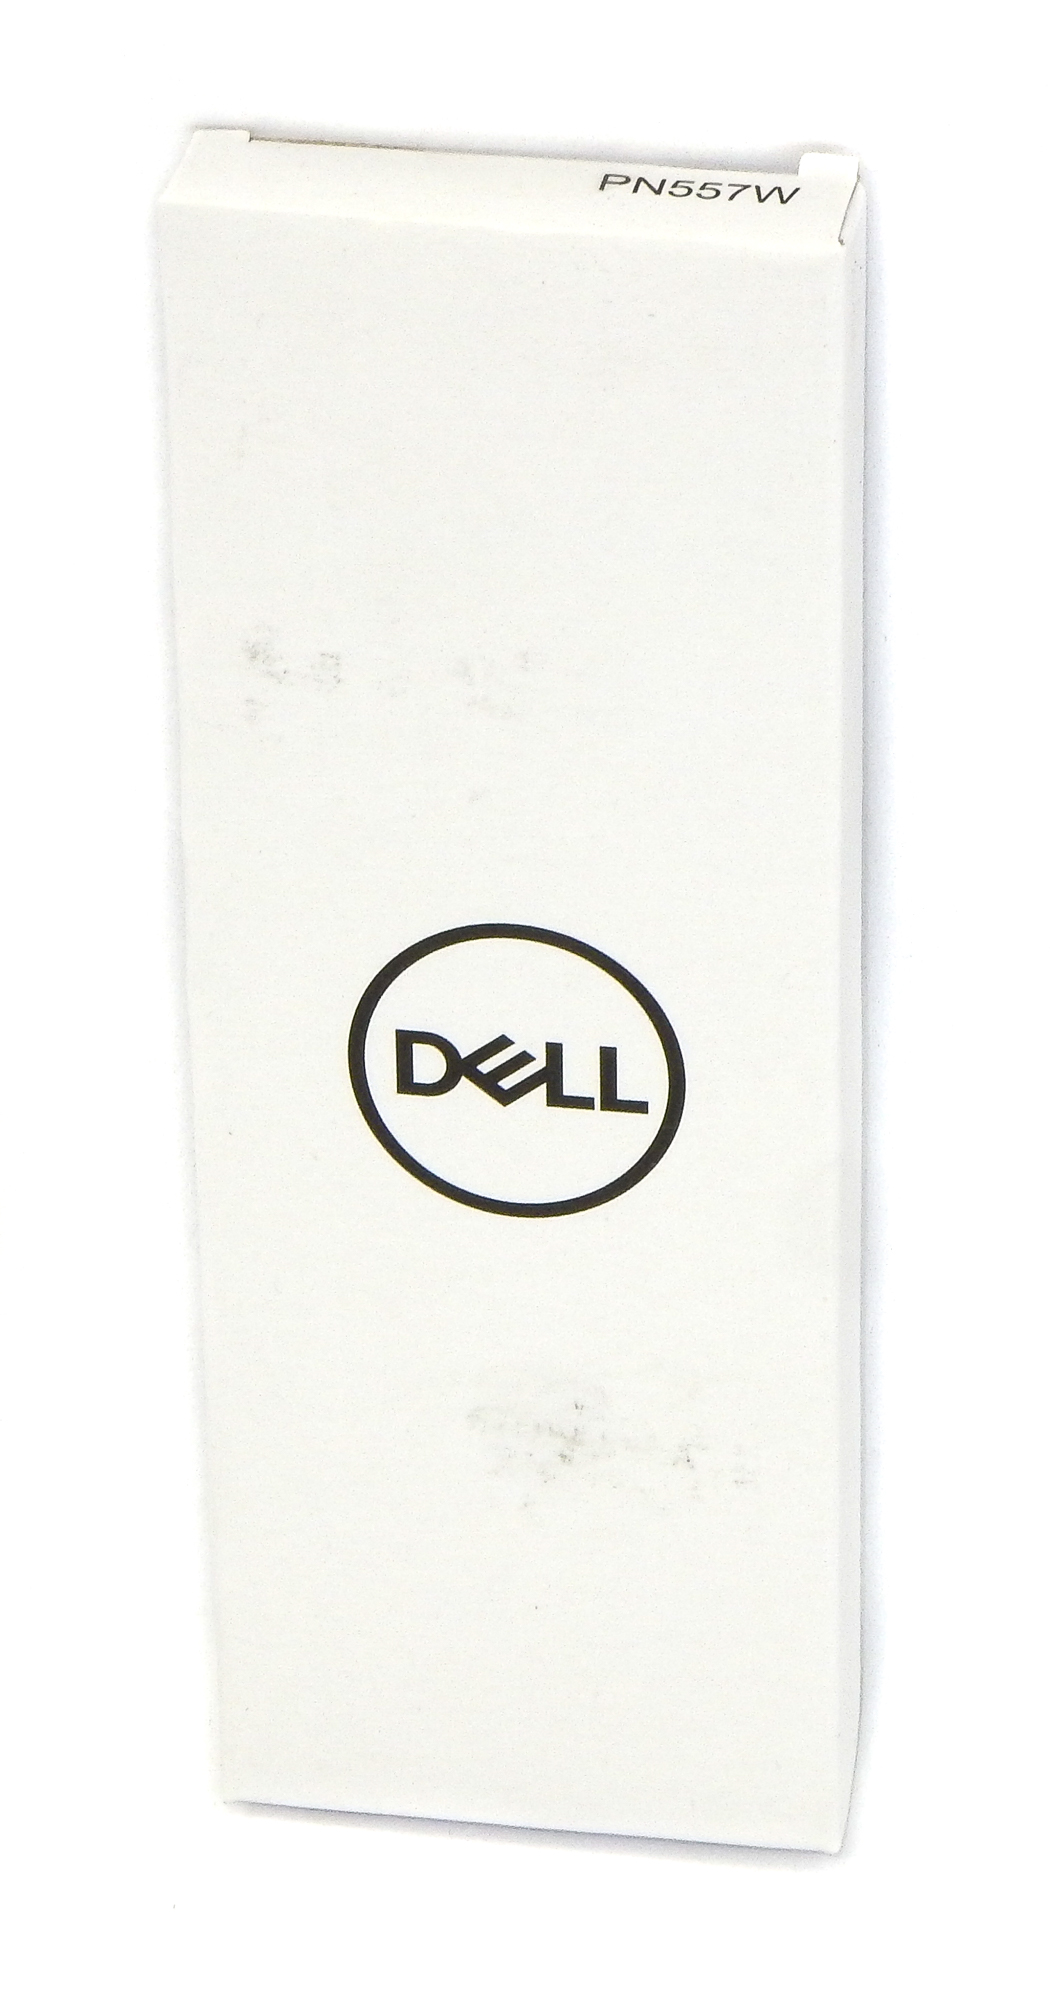 NEW Genuine Dell W1CFM Active Pen PN557W PN557W Stylus